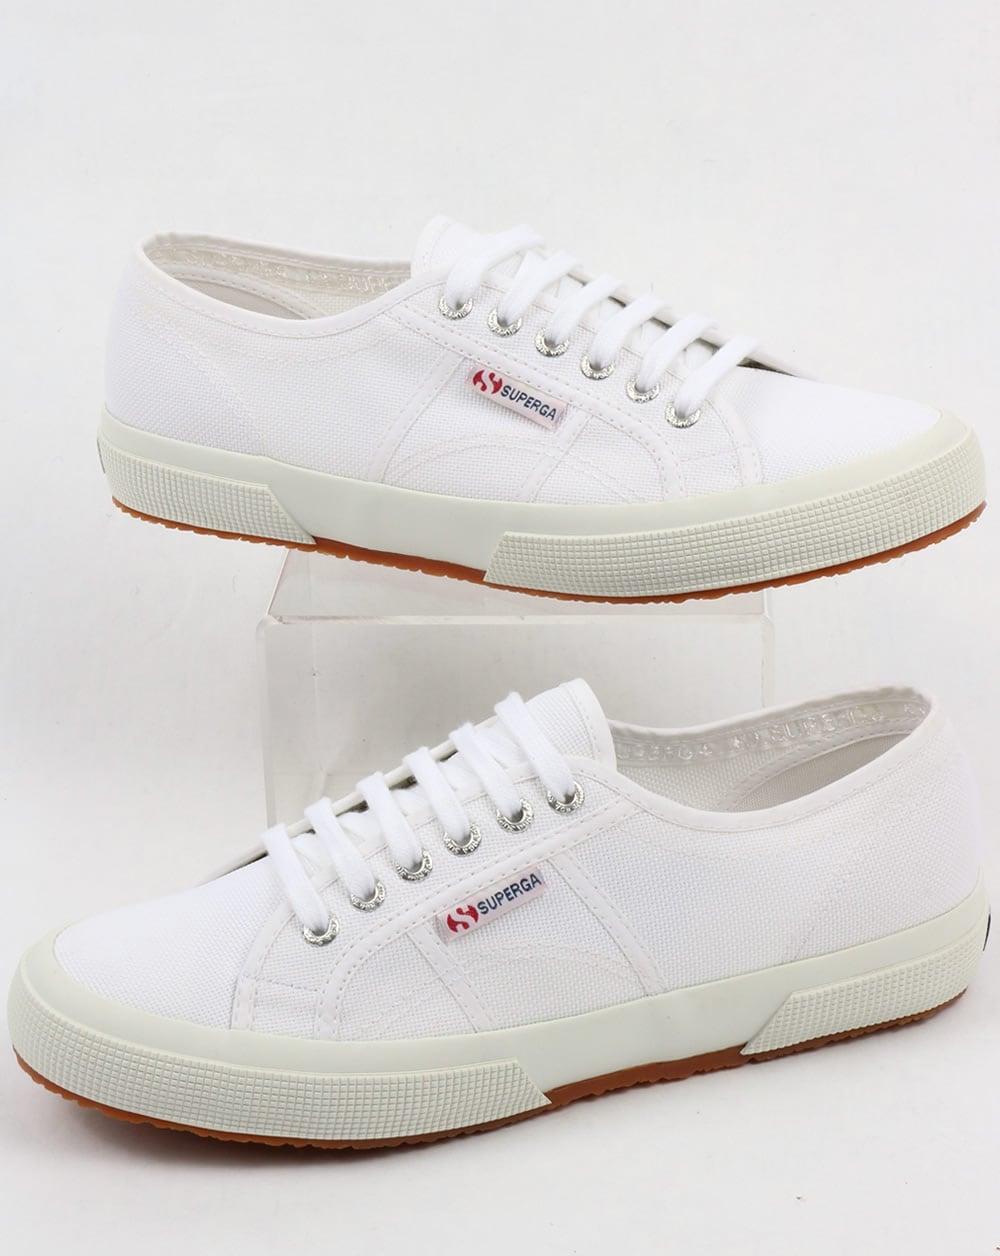 sports shoes 997ed 6b286 Superga 2750 Cotu Classic Pumps White